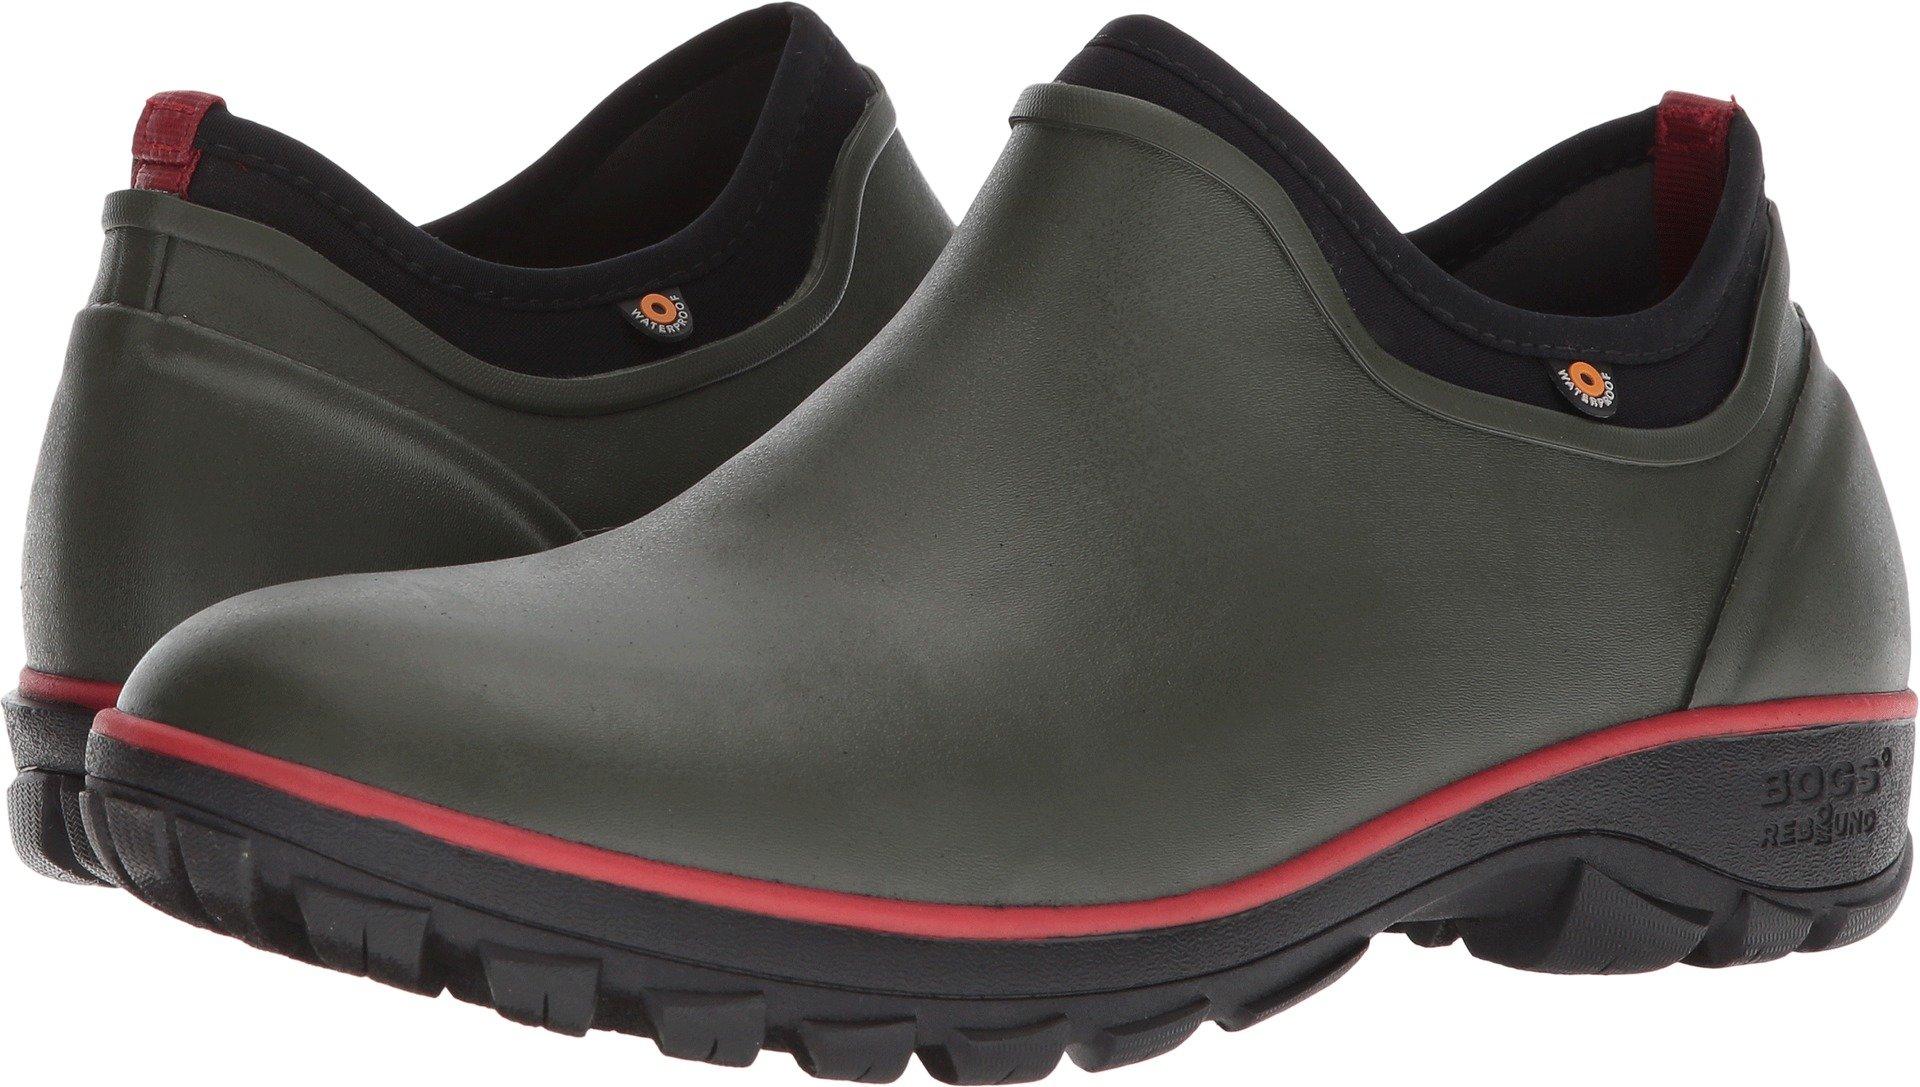 Bogs Men's Sauvie Slip On Soft Toe Rain Boot, Dark Green, 12 D(M) US